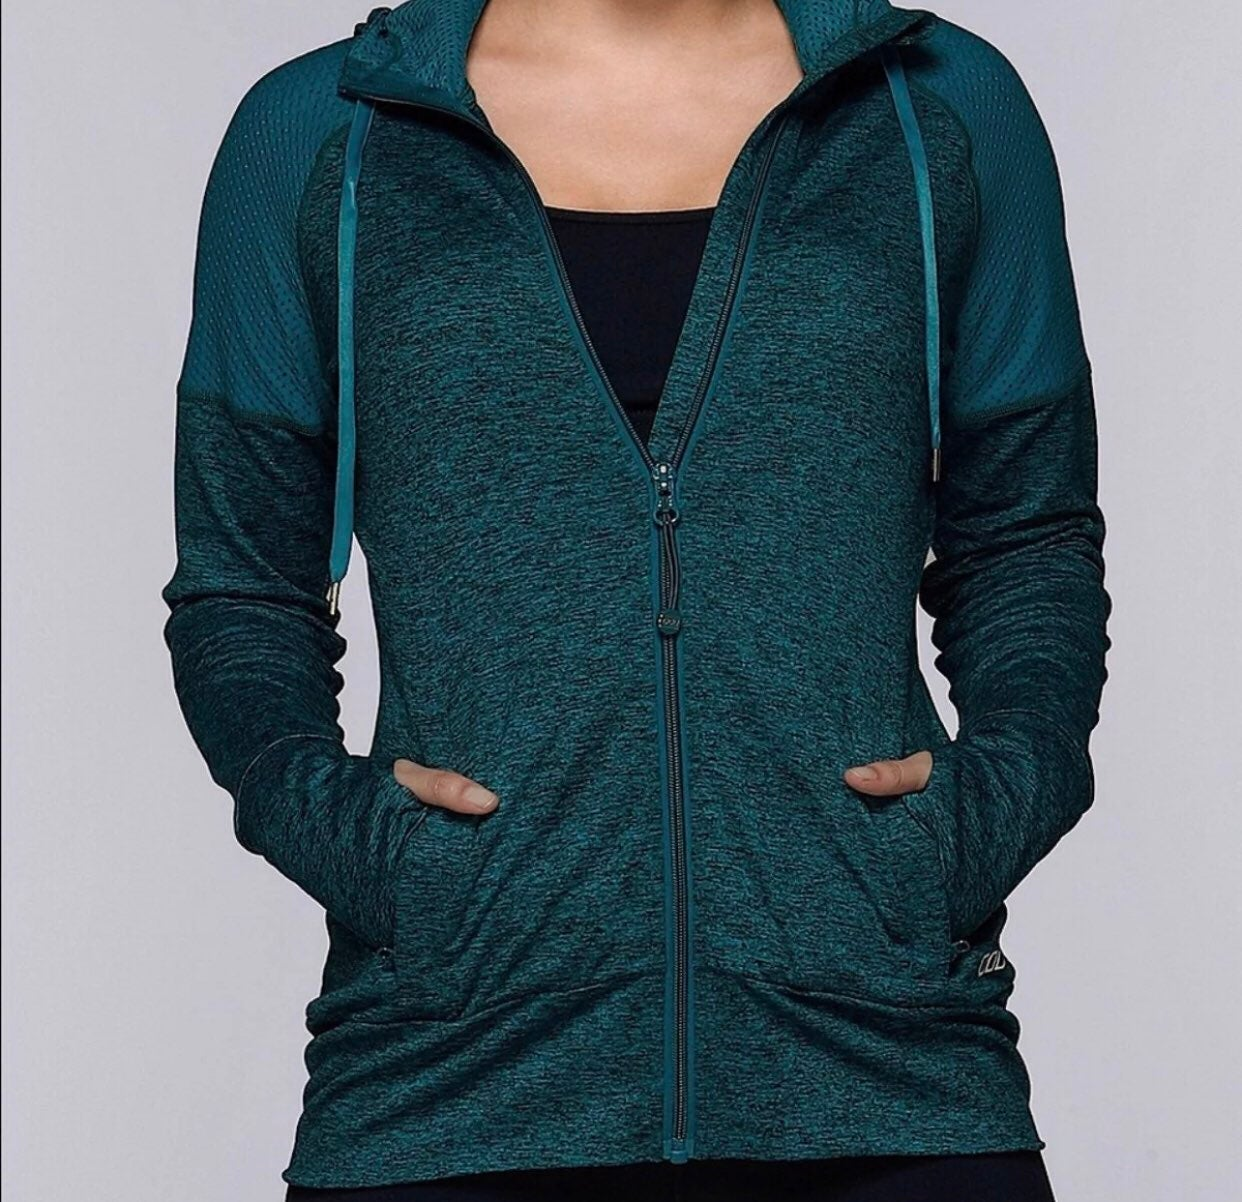 Lorna Jane Embrace L/Slv Maxum Jacket